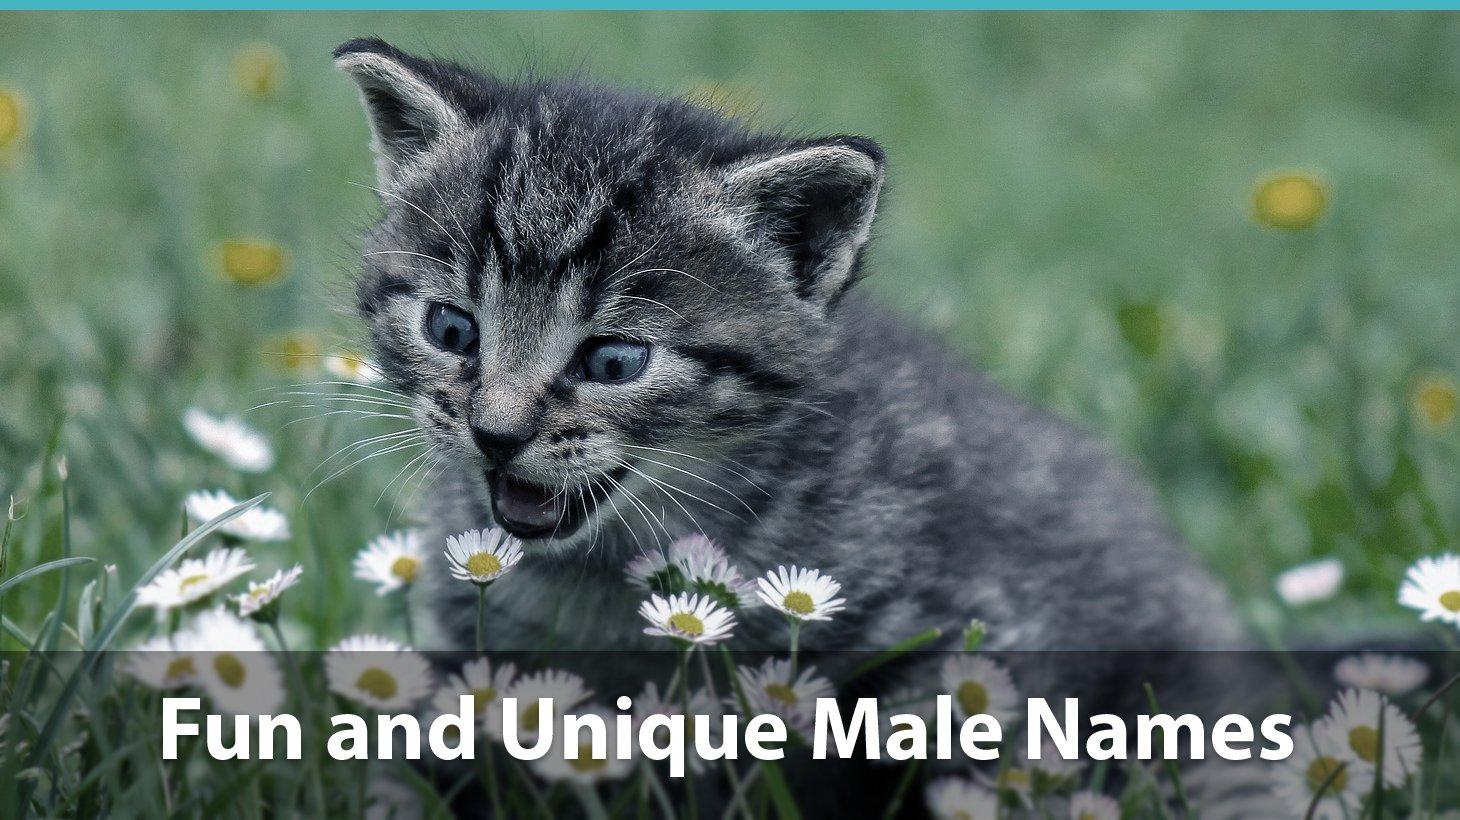 Top 200 Names For Boy Cats Cute Funny Unique Pun Names